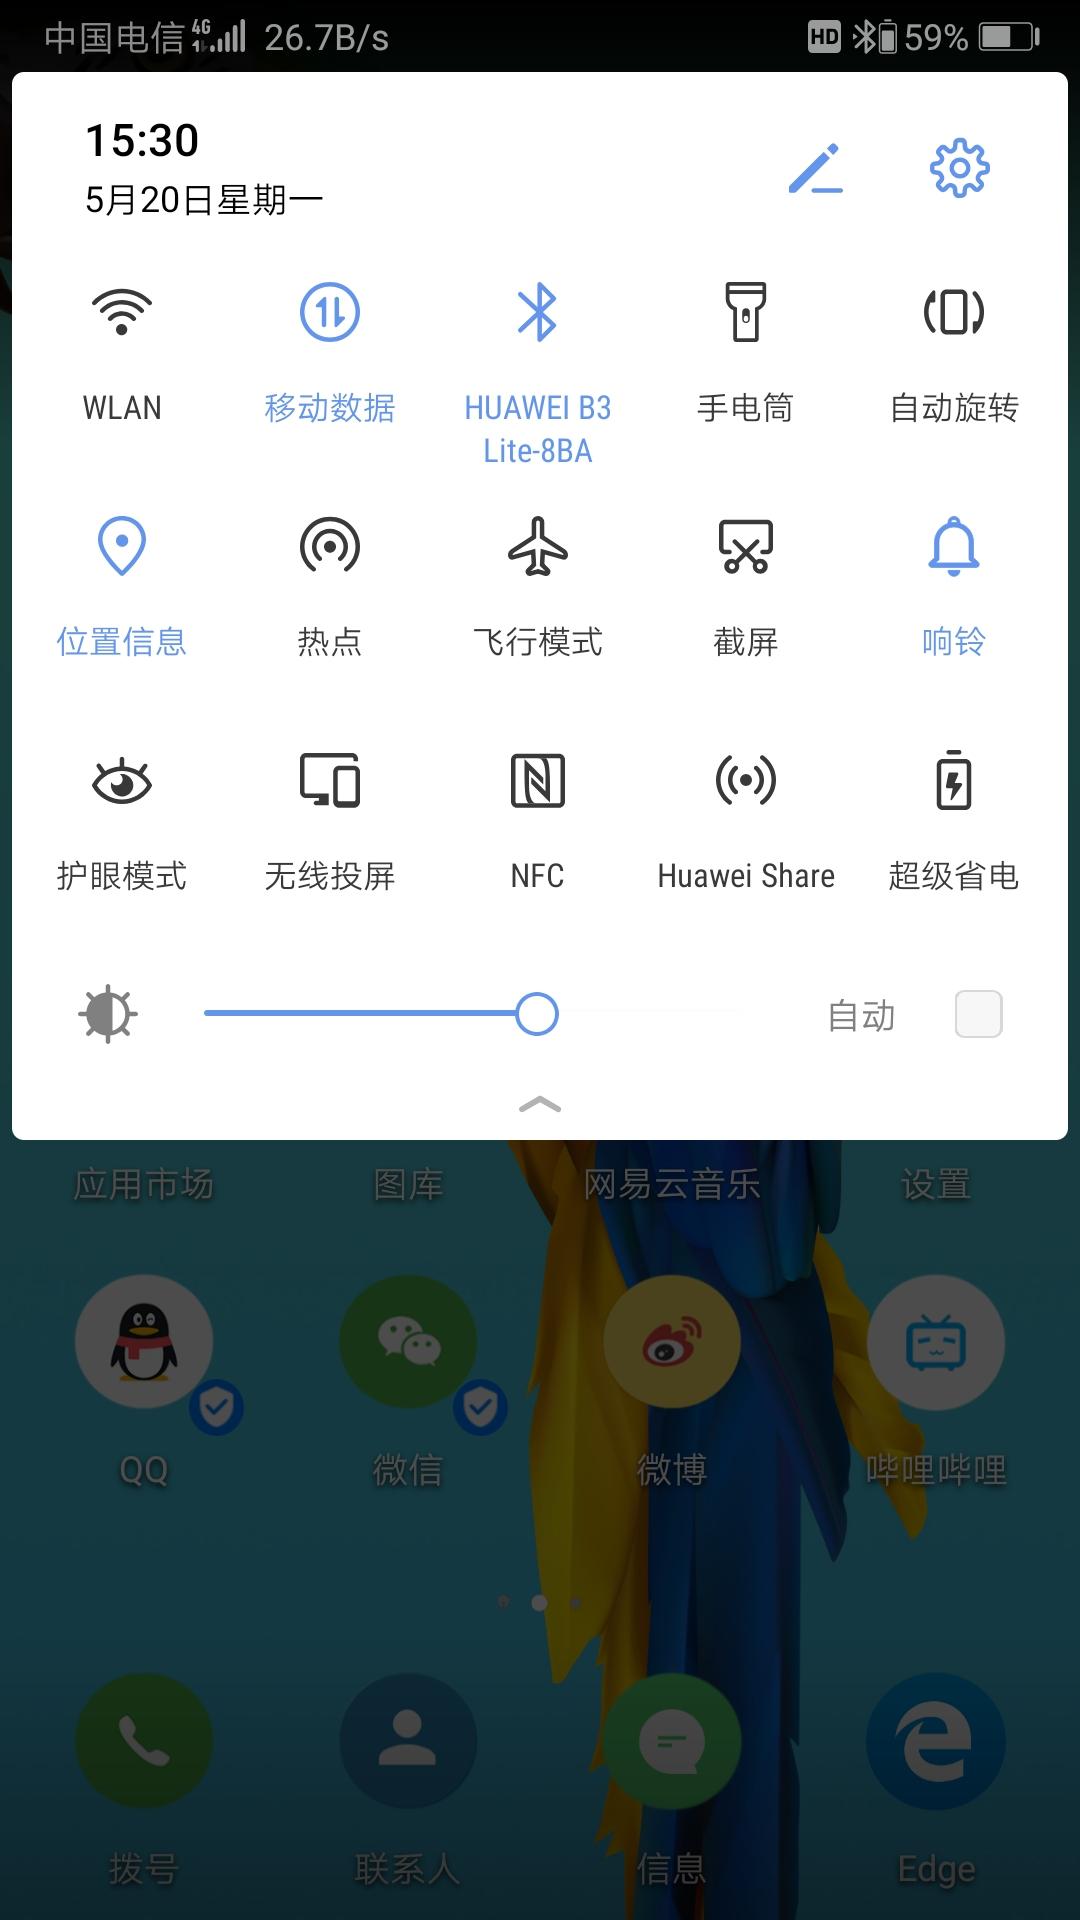 Screenshot_20190520_153052_com.huawei.android.lau.jpg